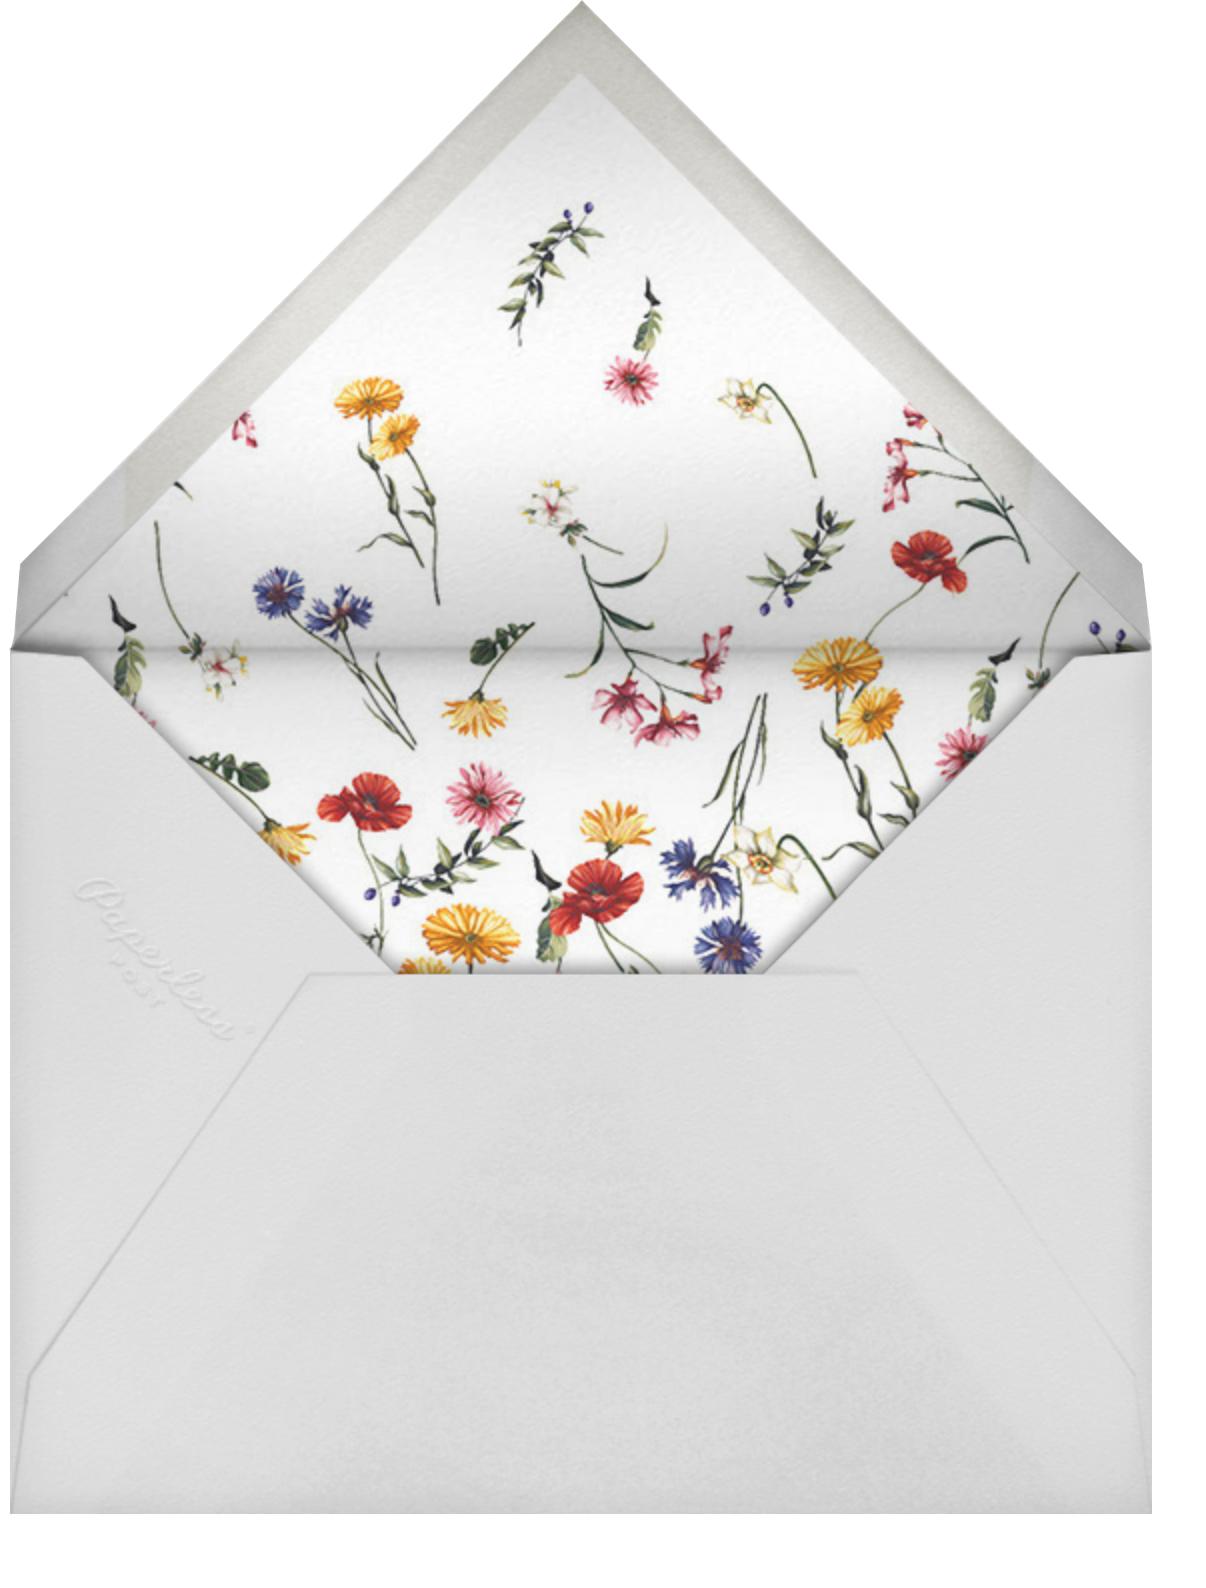 Floating Floral (Invitation) - Oscar de la Renta - Envelope